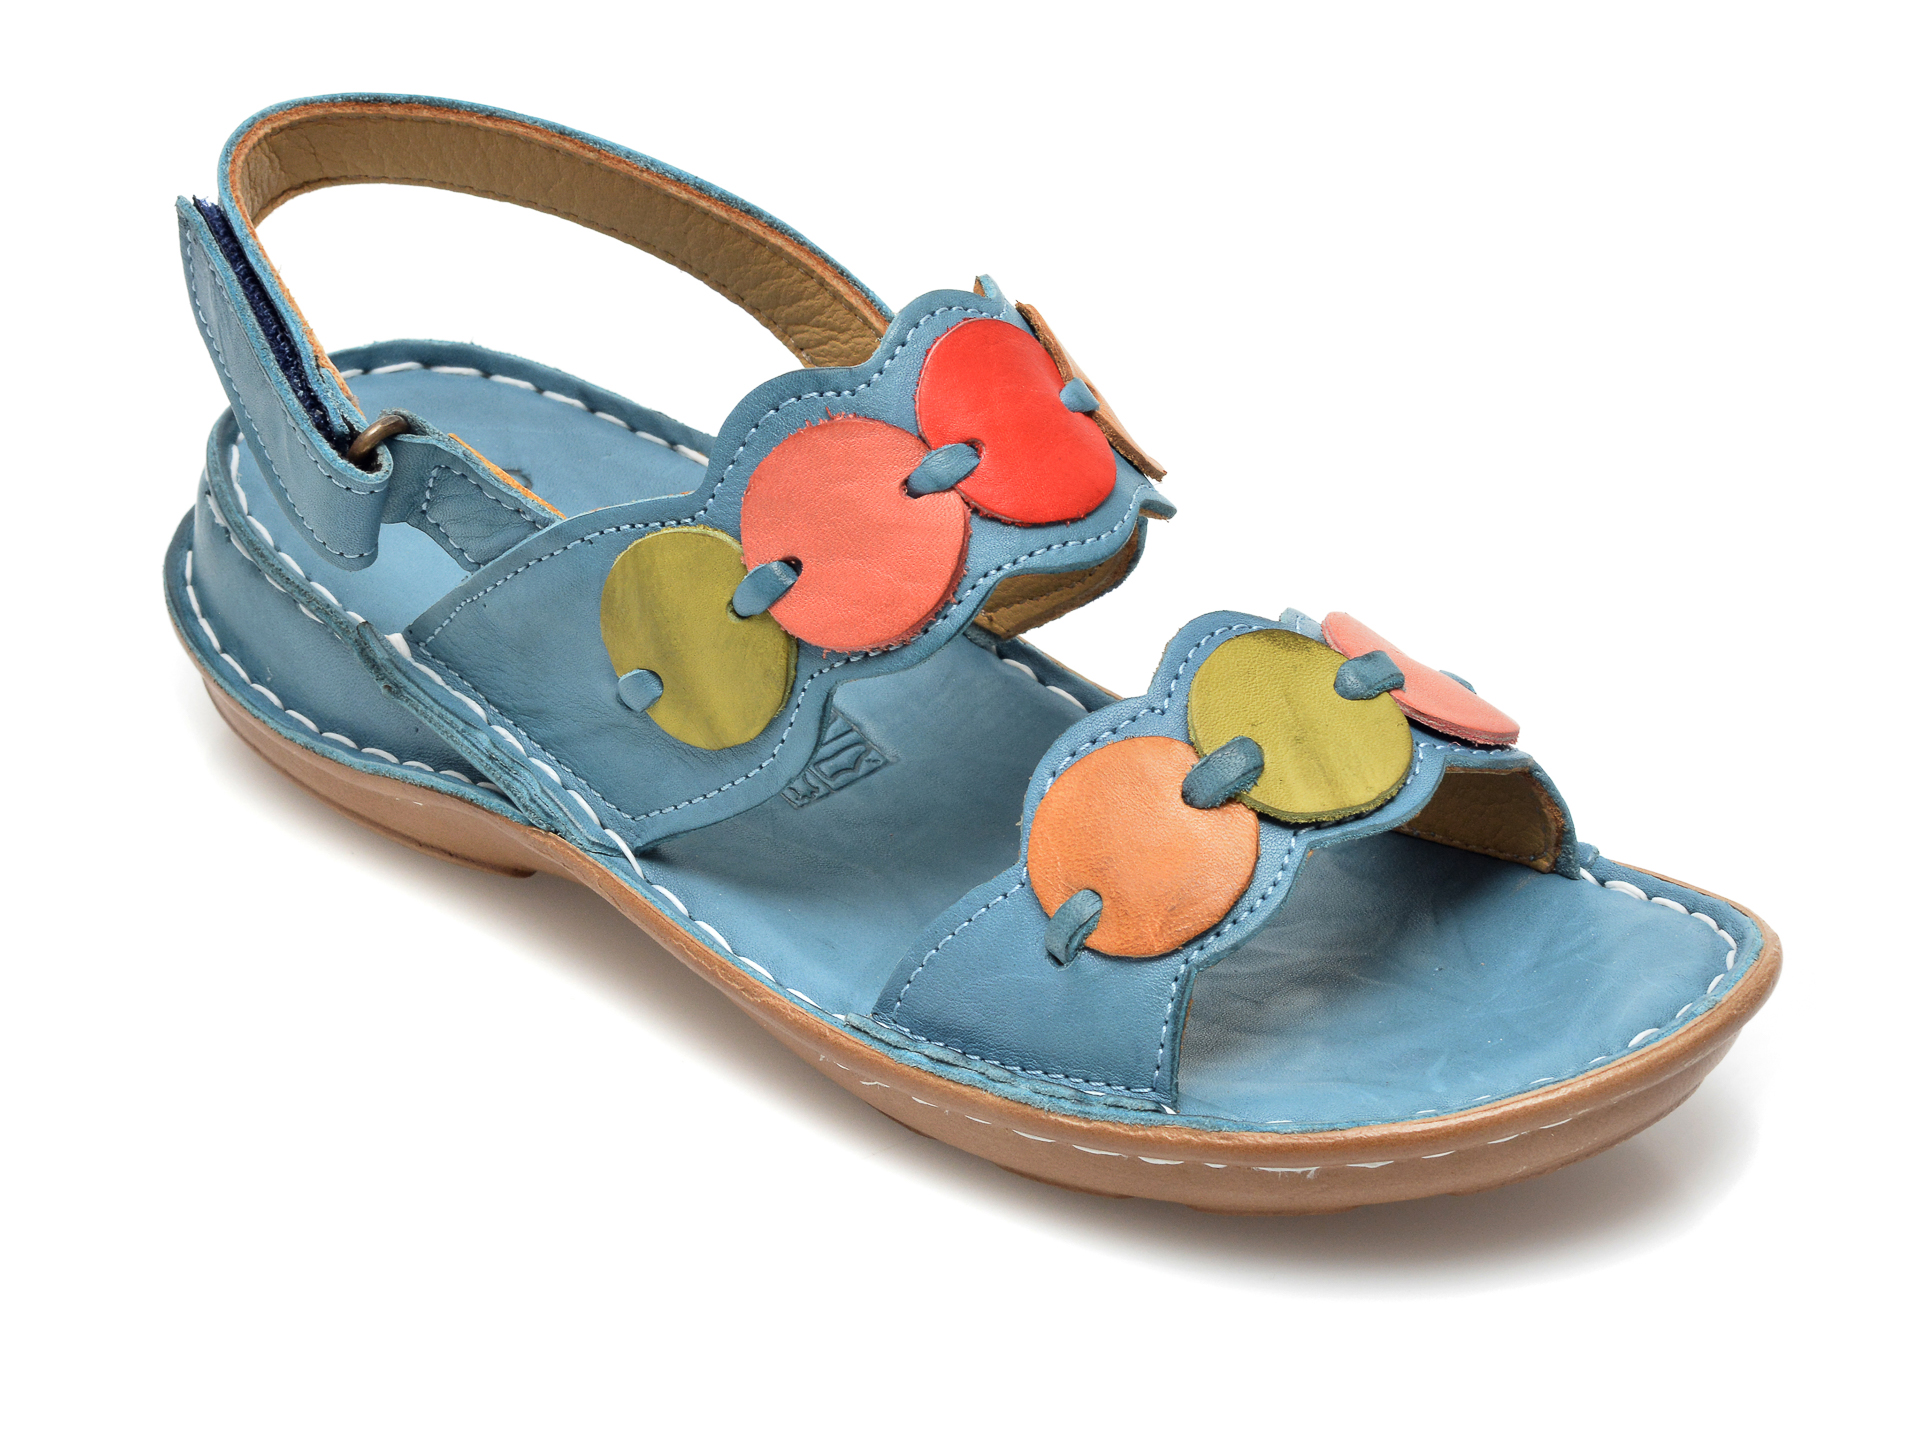 Sandale PAVARELLA albastre, 3001433, din piele naturala imagine otter.ro 2021